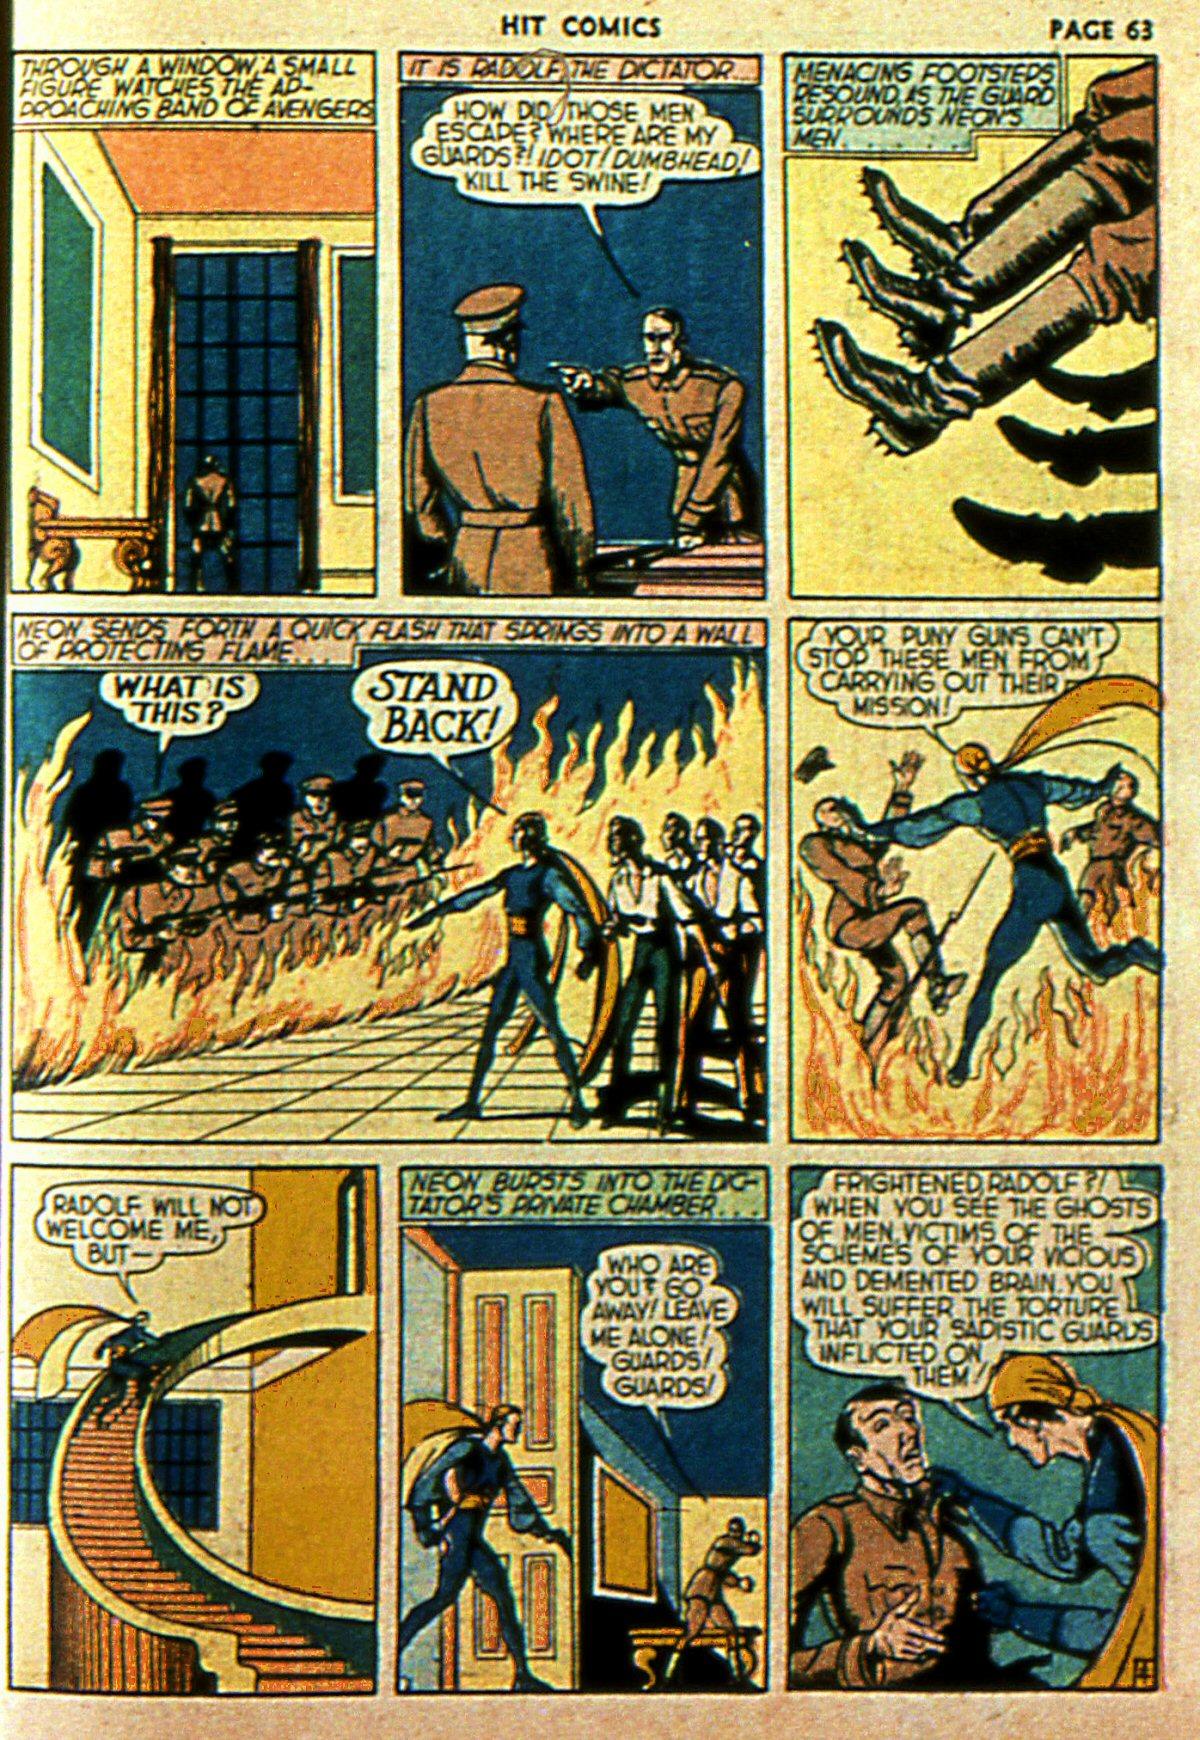 Read online Hit Comics comic -  Issue #2 - 65